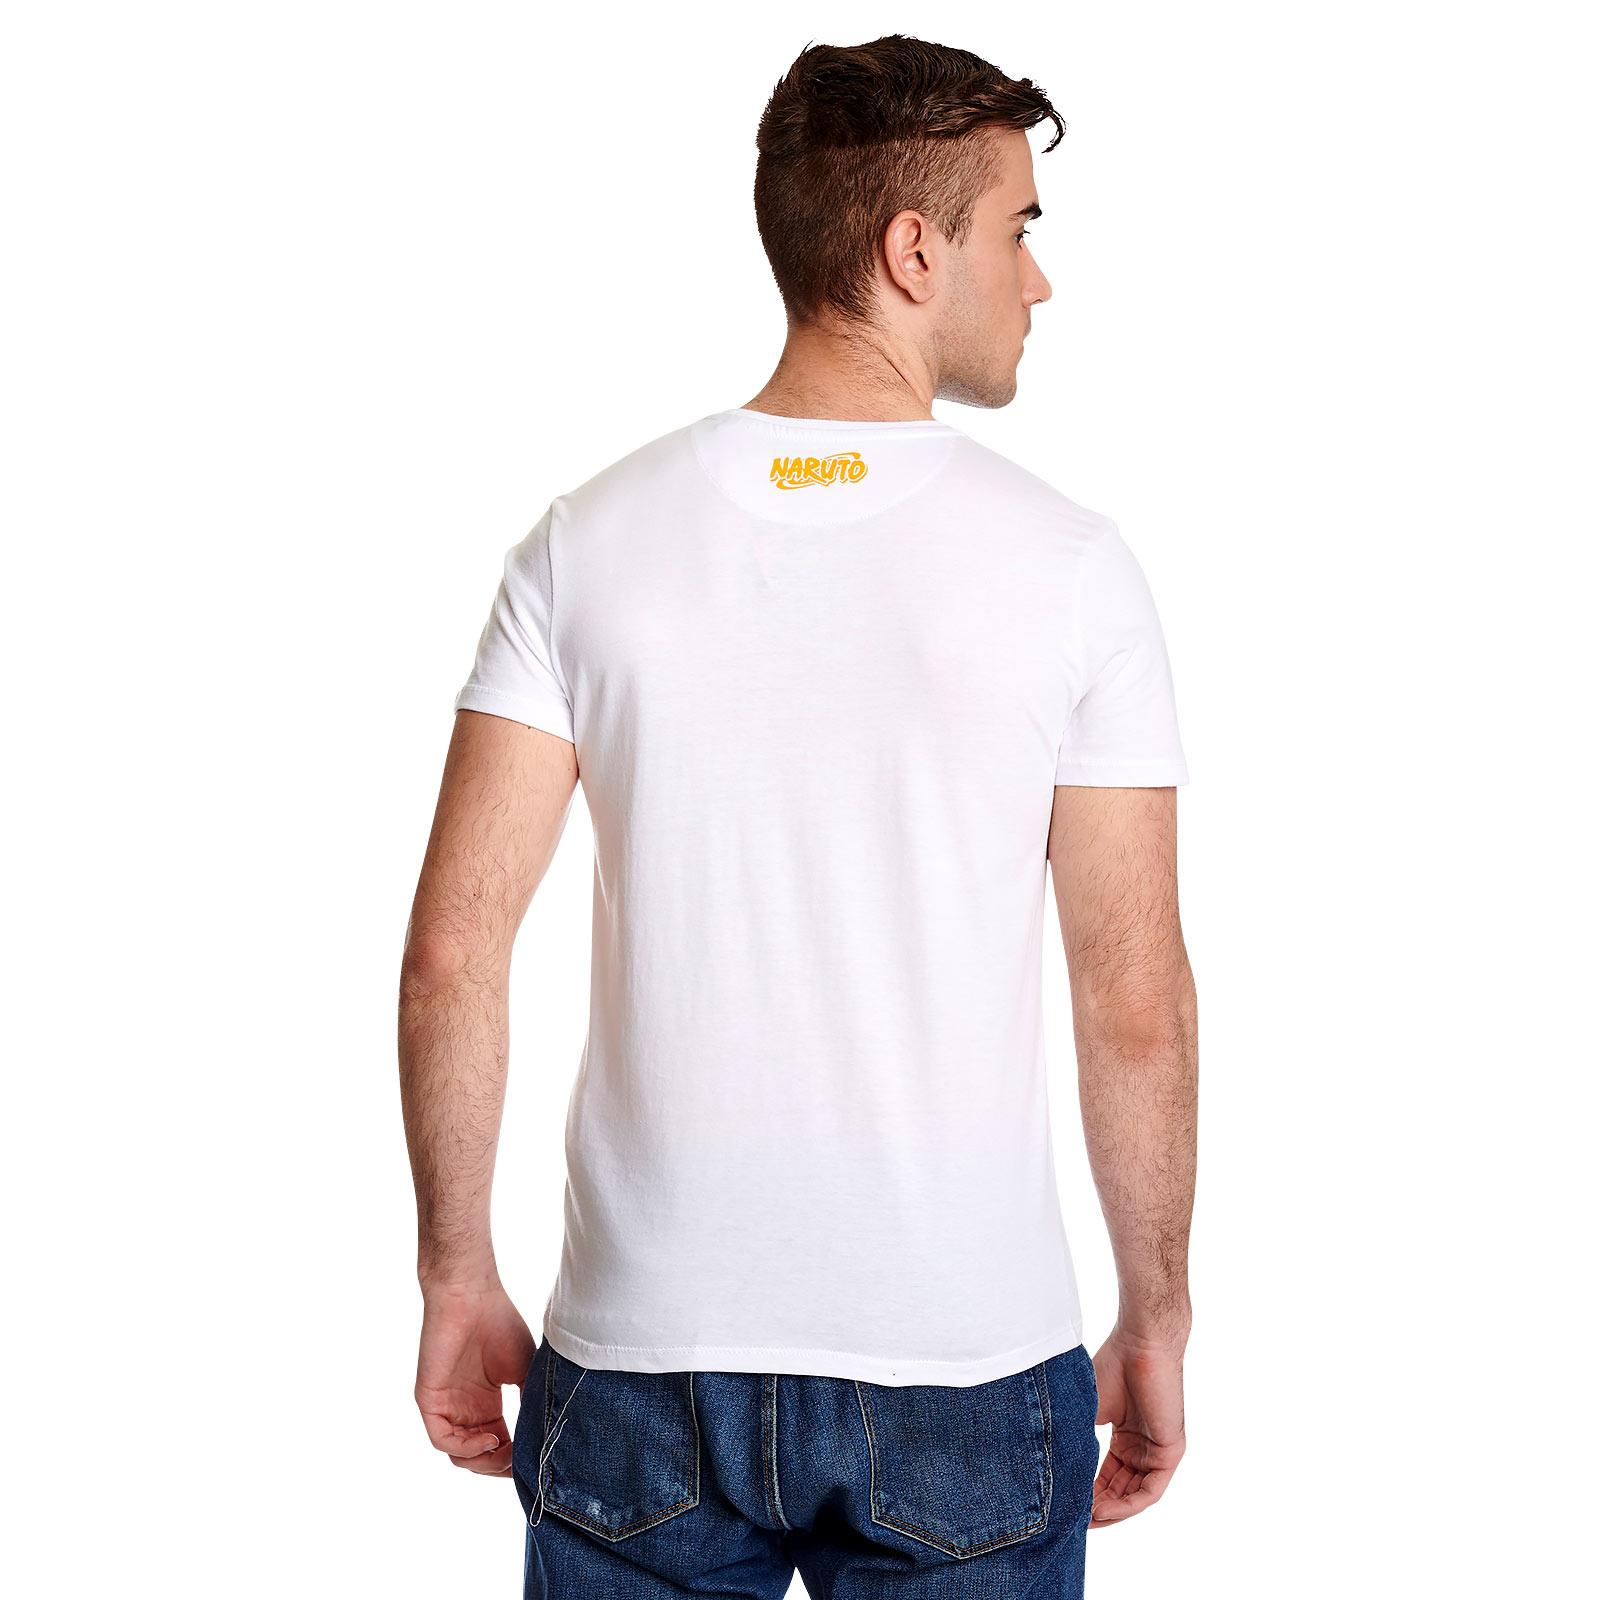 Naruto - Monochrome Sketch T-Shirt weiß